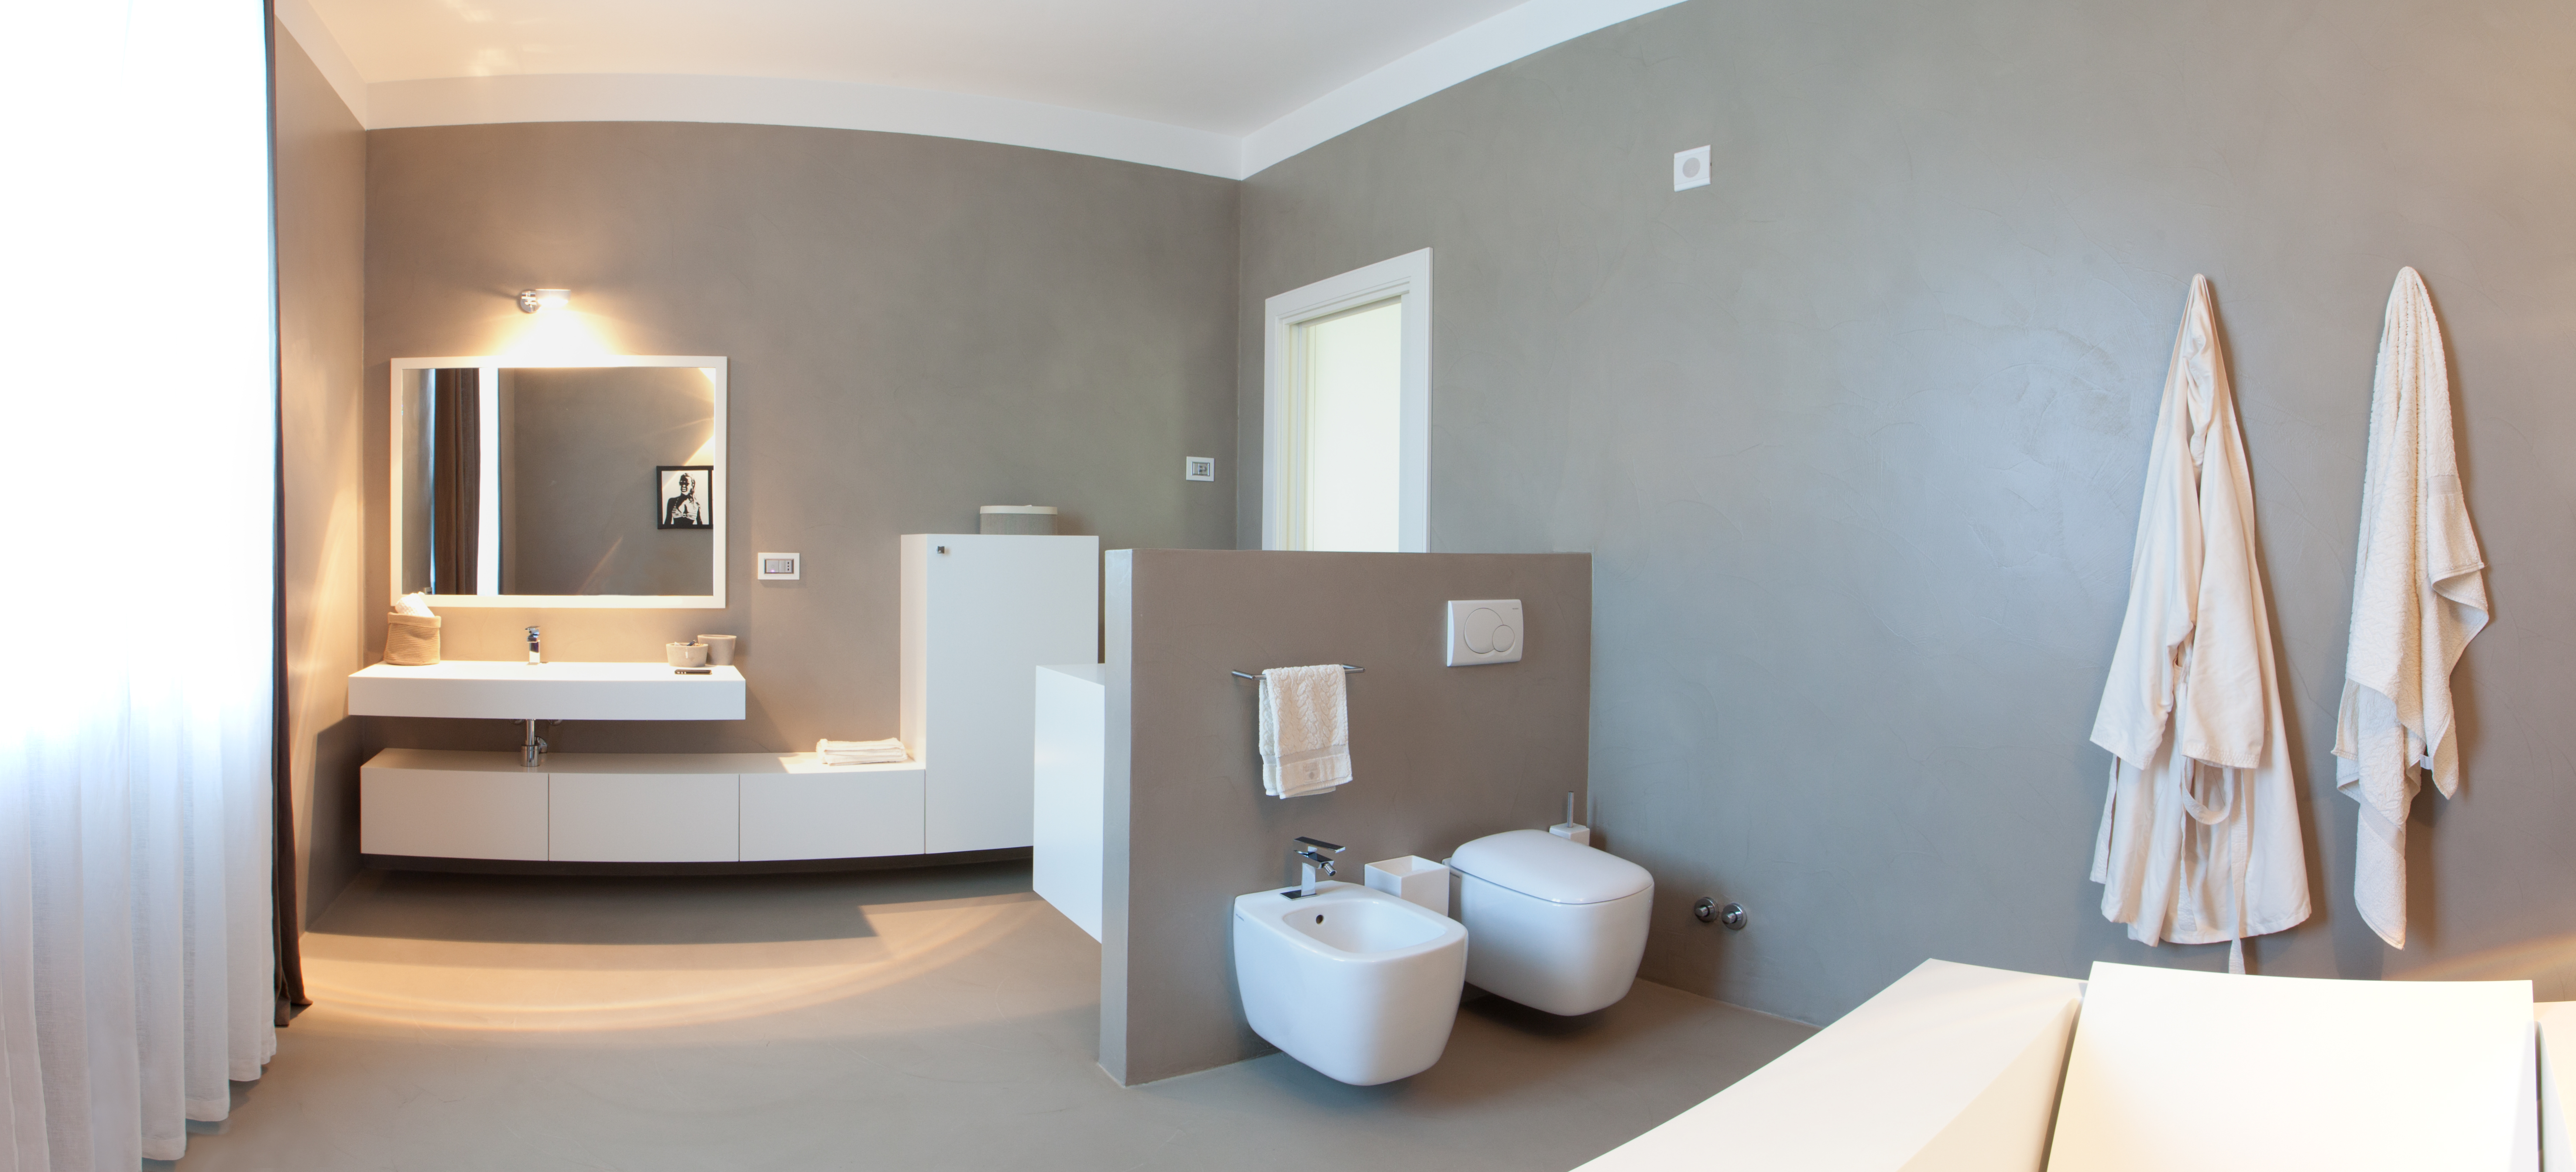 resina decorativa esempio bagno